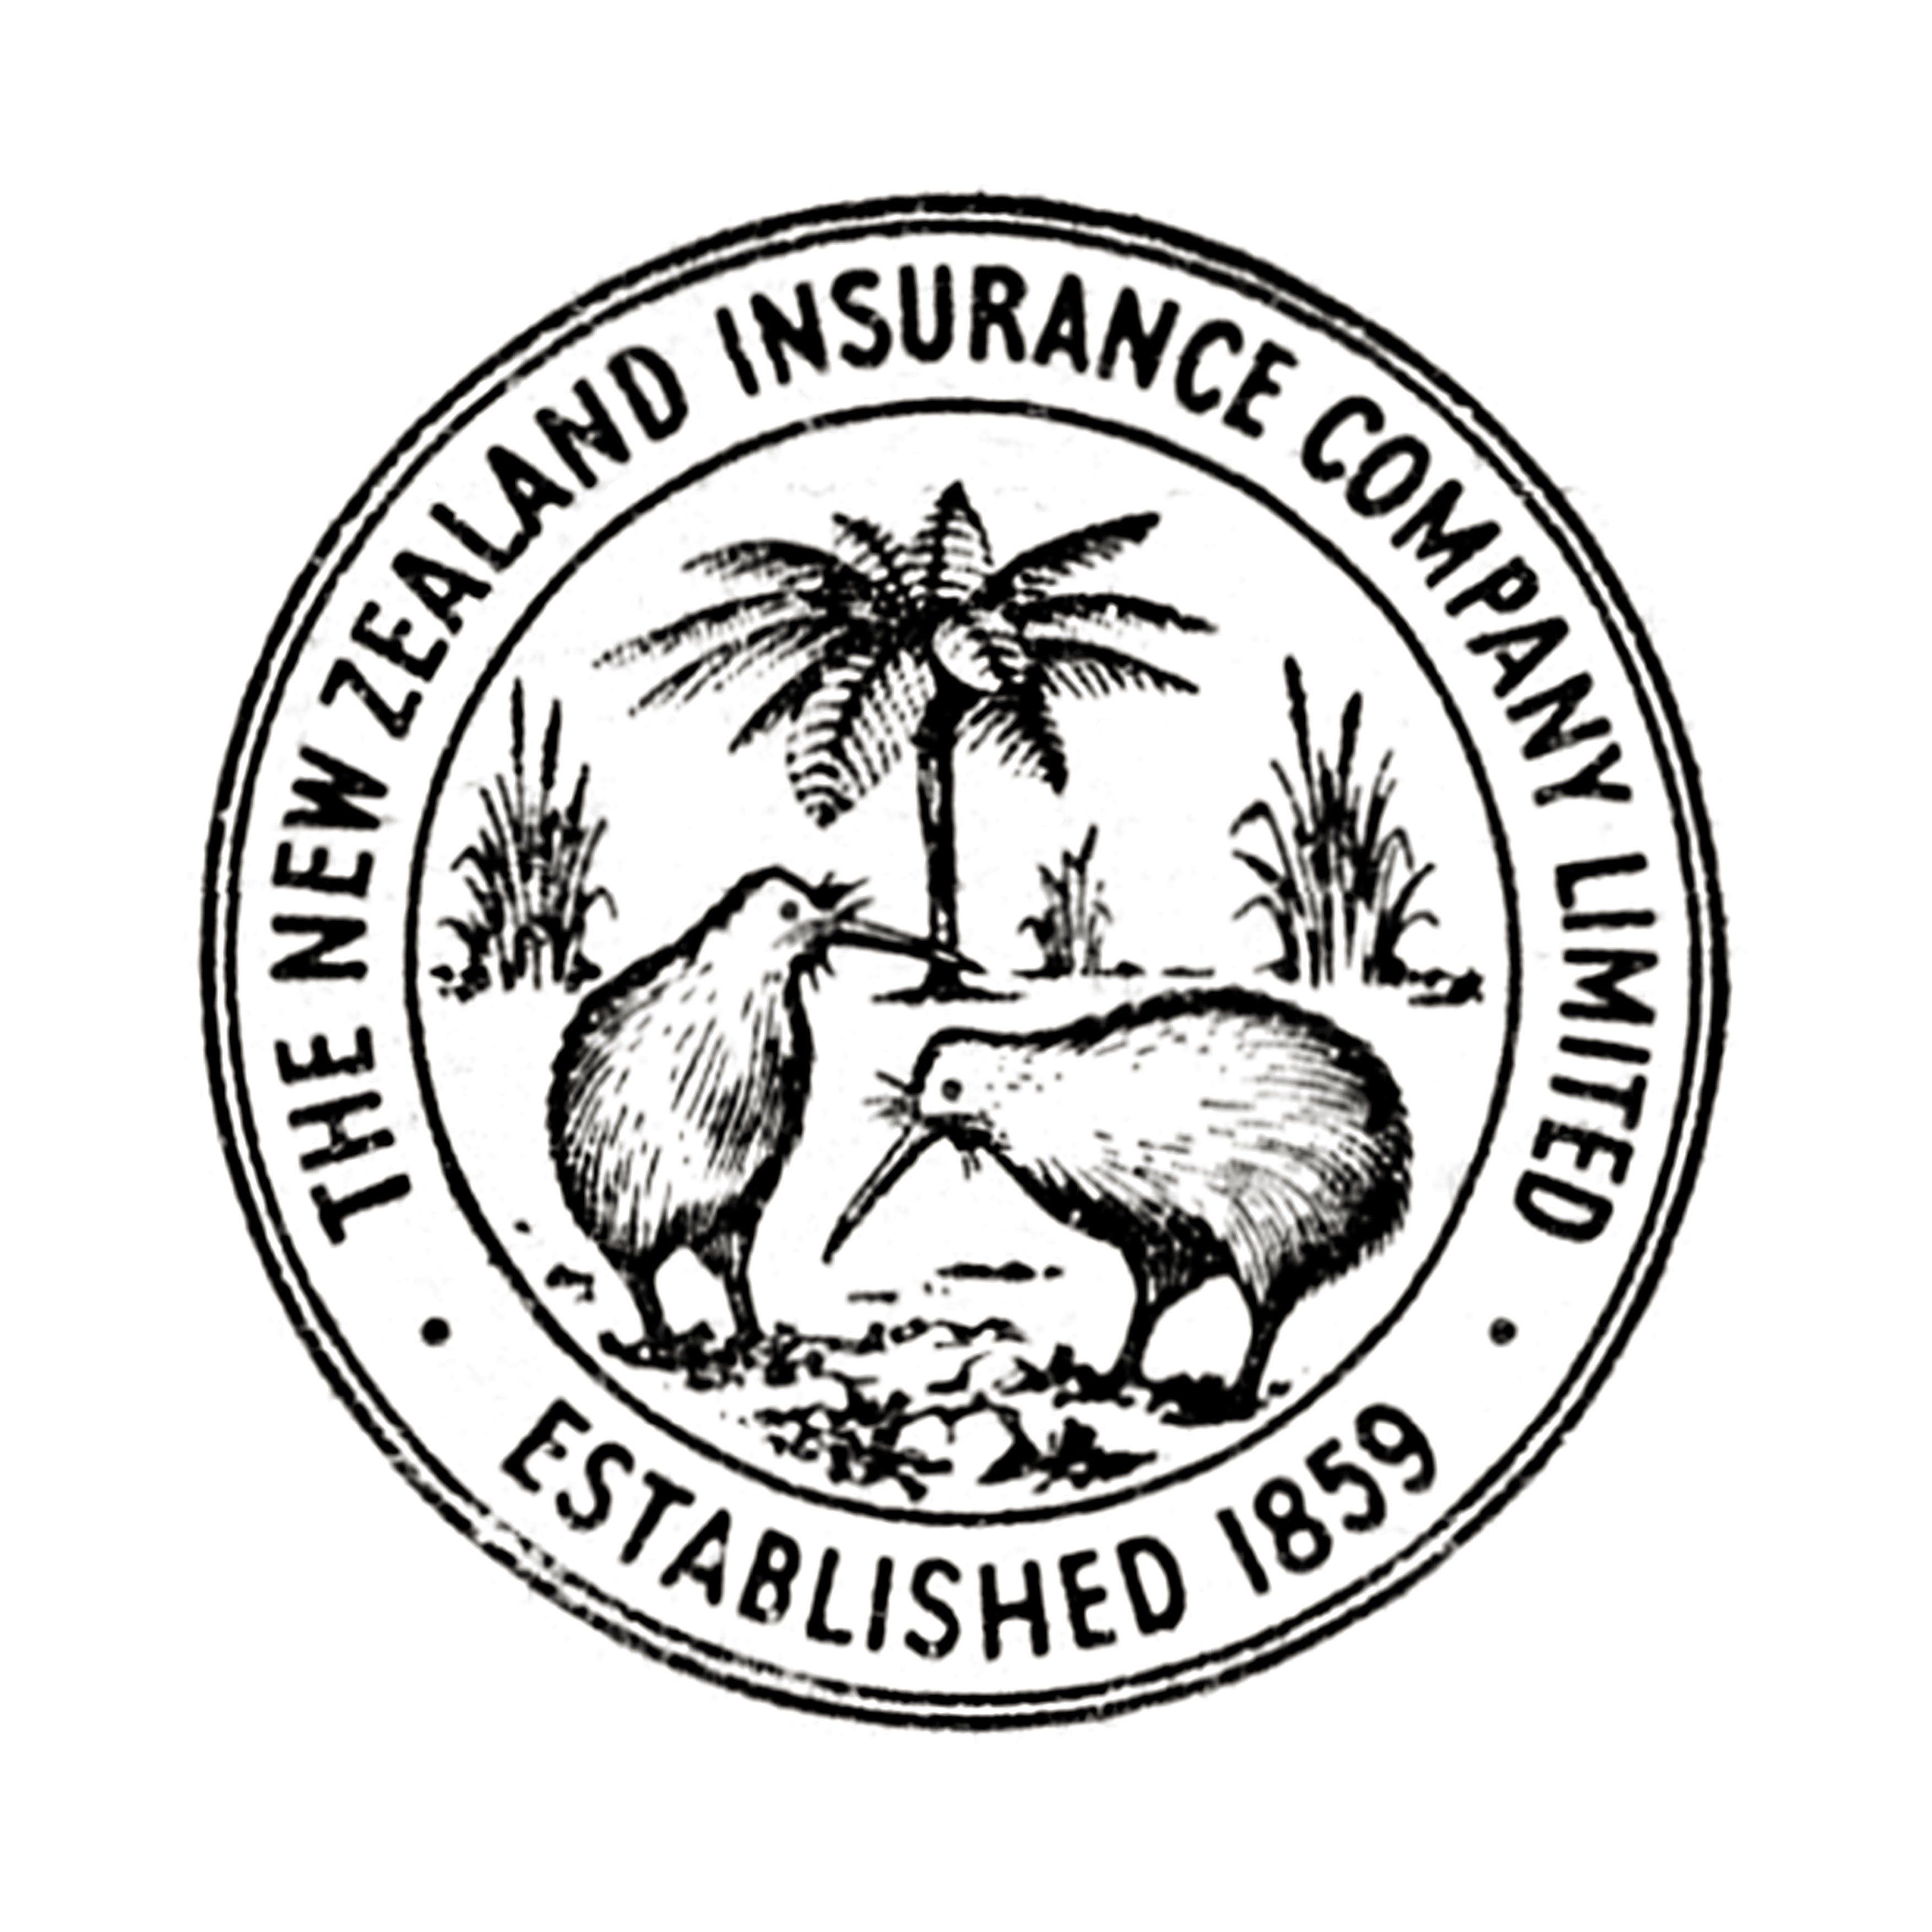 New Zealand Insurance Press Advertisement Featuring Kiwi Bird